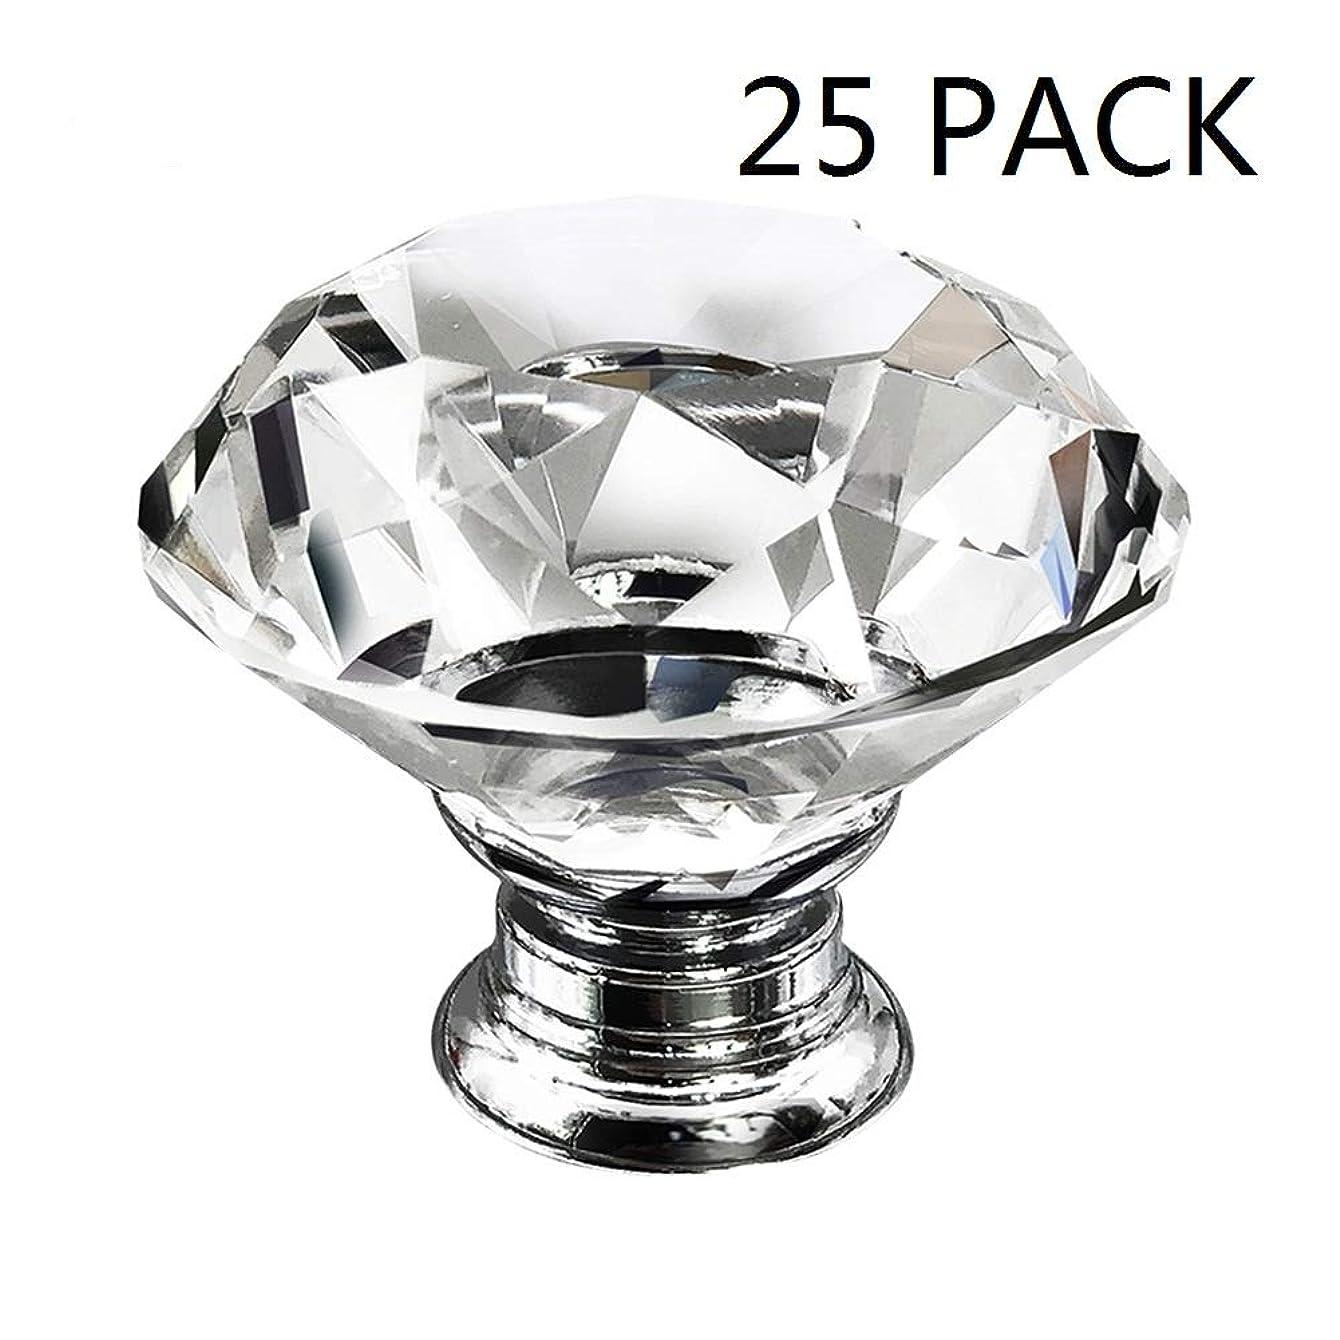 Dresser Crystal Knobs - 30MM 25 PCS Glass Crystal Drawer Knobs Pulls Cabinet Handle for Home Kitchen Wardrobe Cupboard mvsgzynjmncjm59